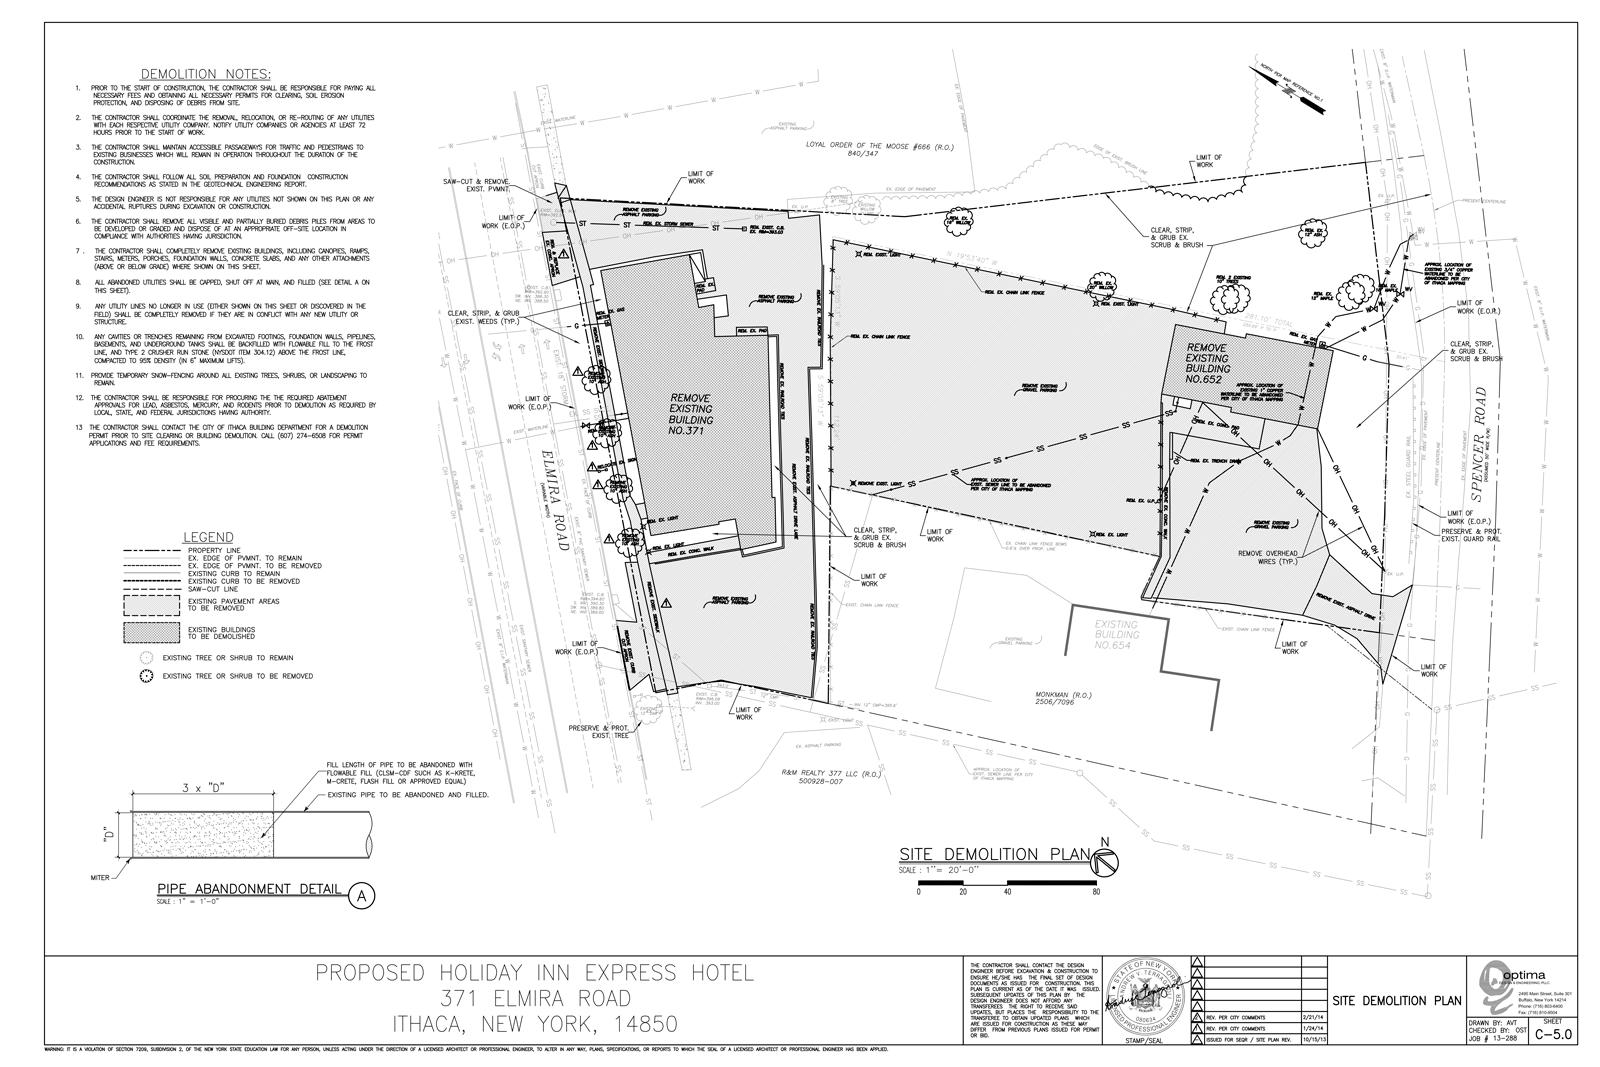 Elmira-Road-371---4-Story-Hotel---Revised-Drawings---02-21-14-Demo